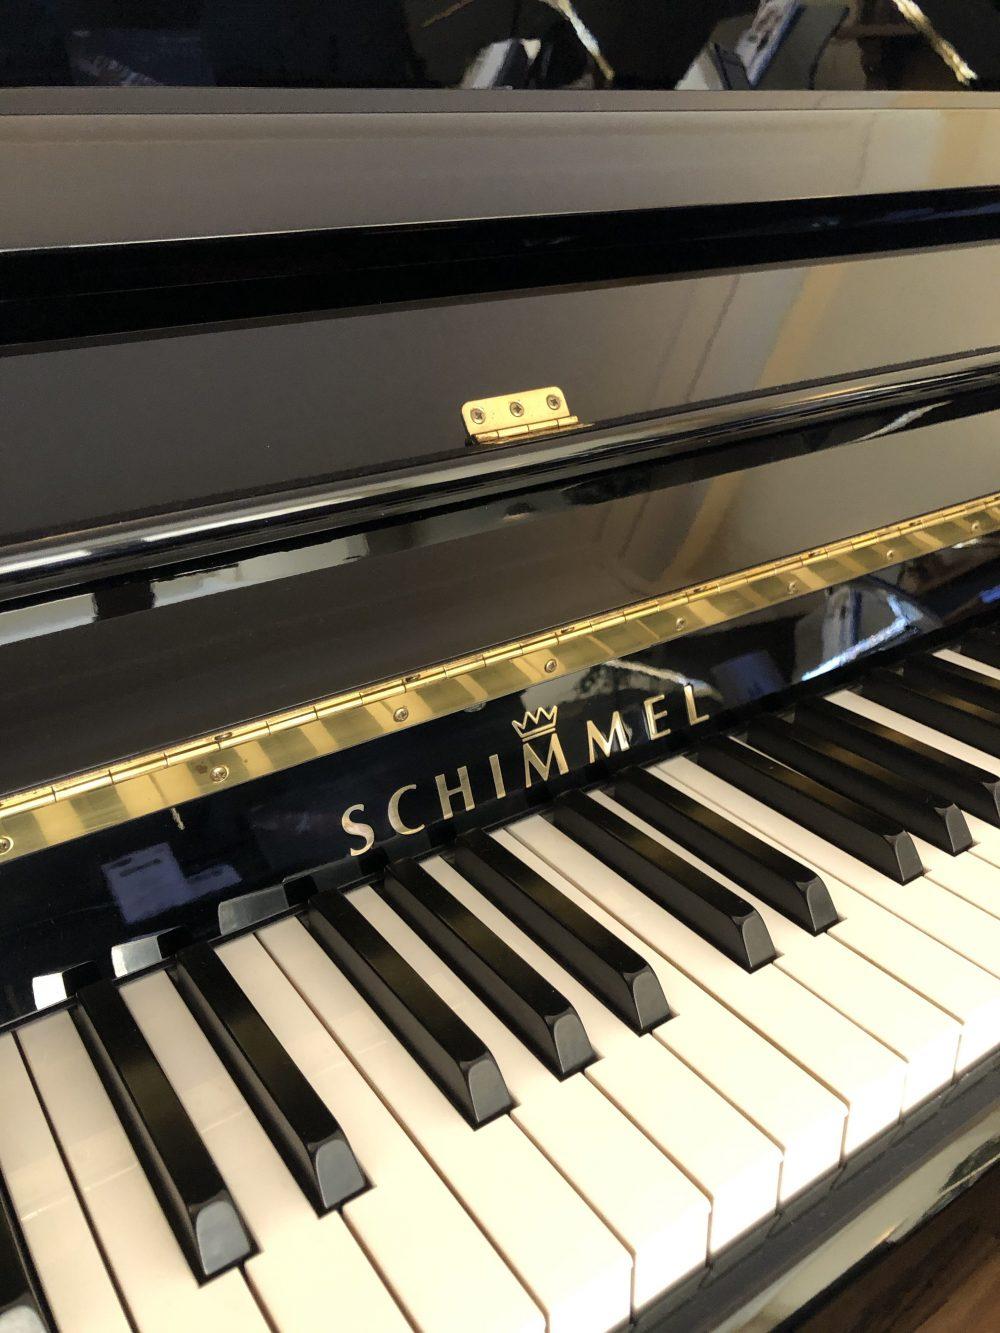 Schimmel upright